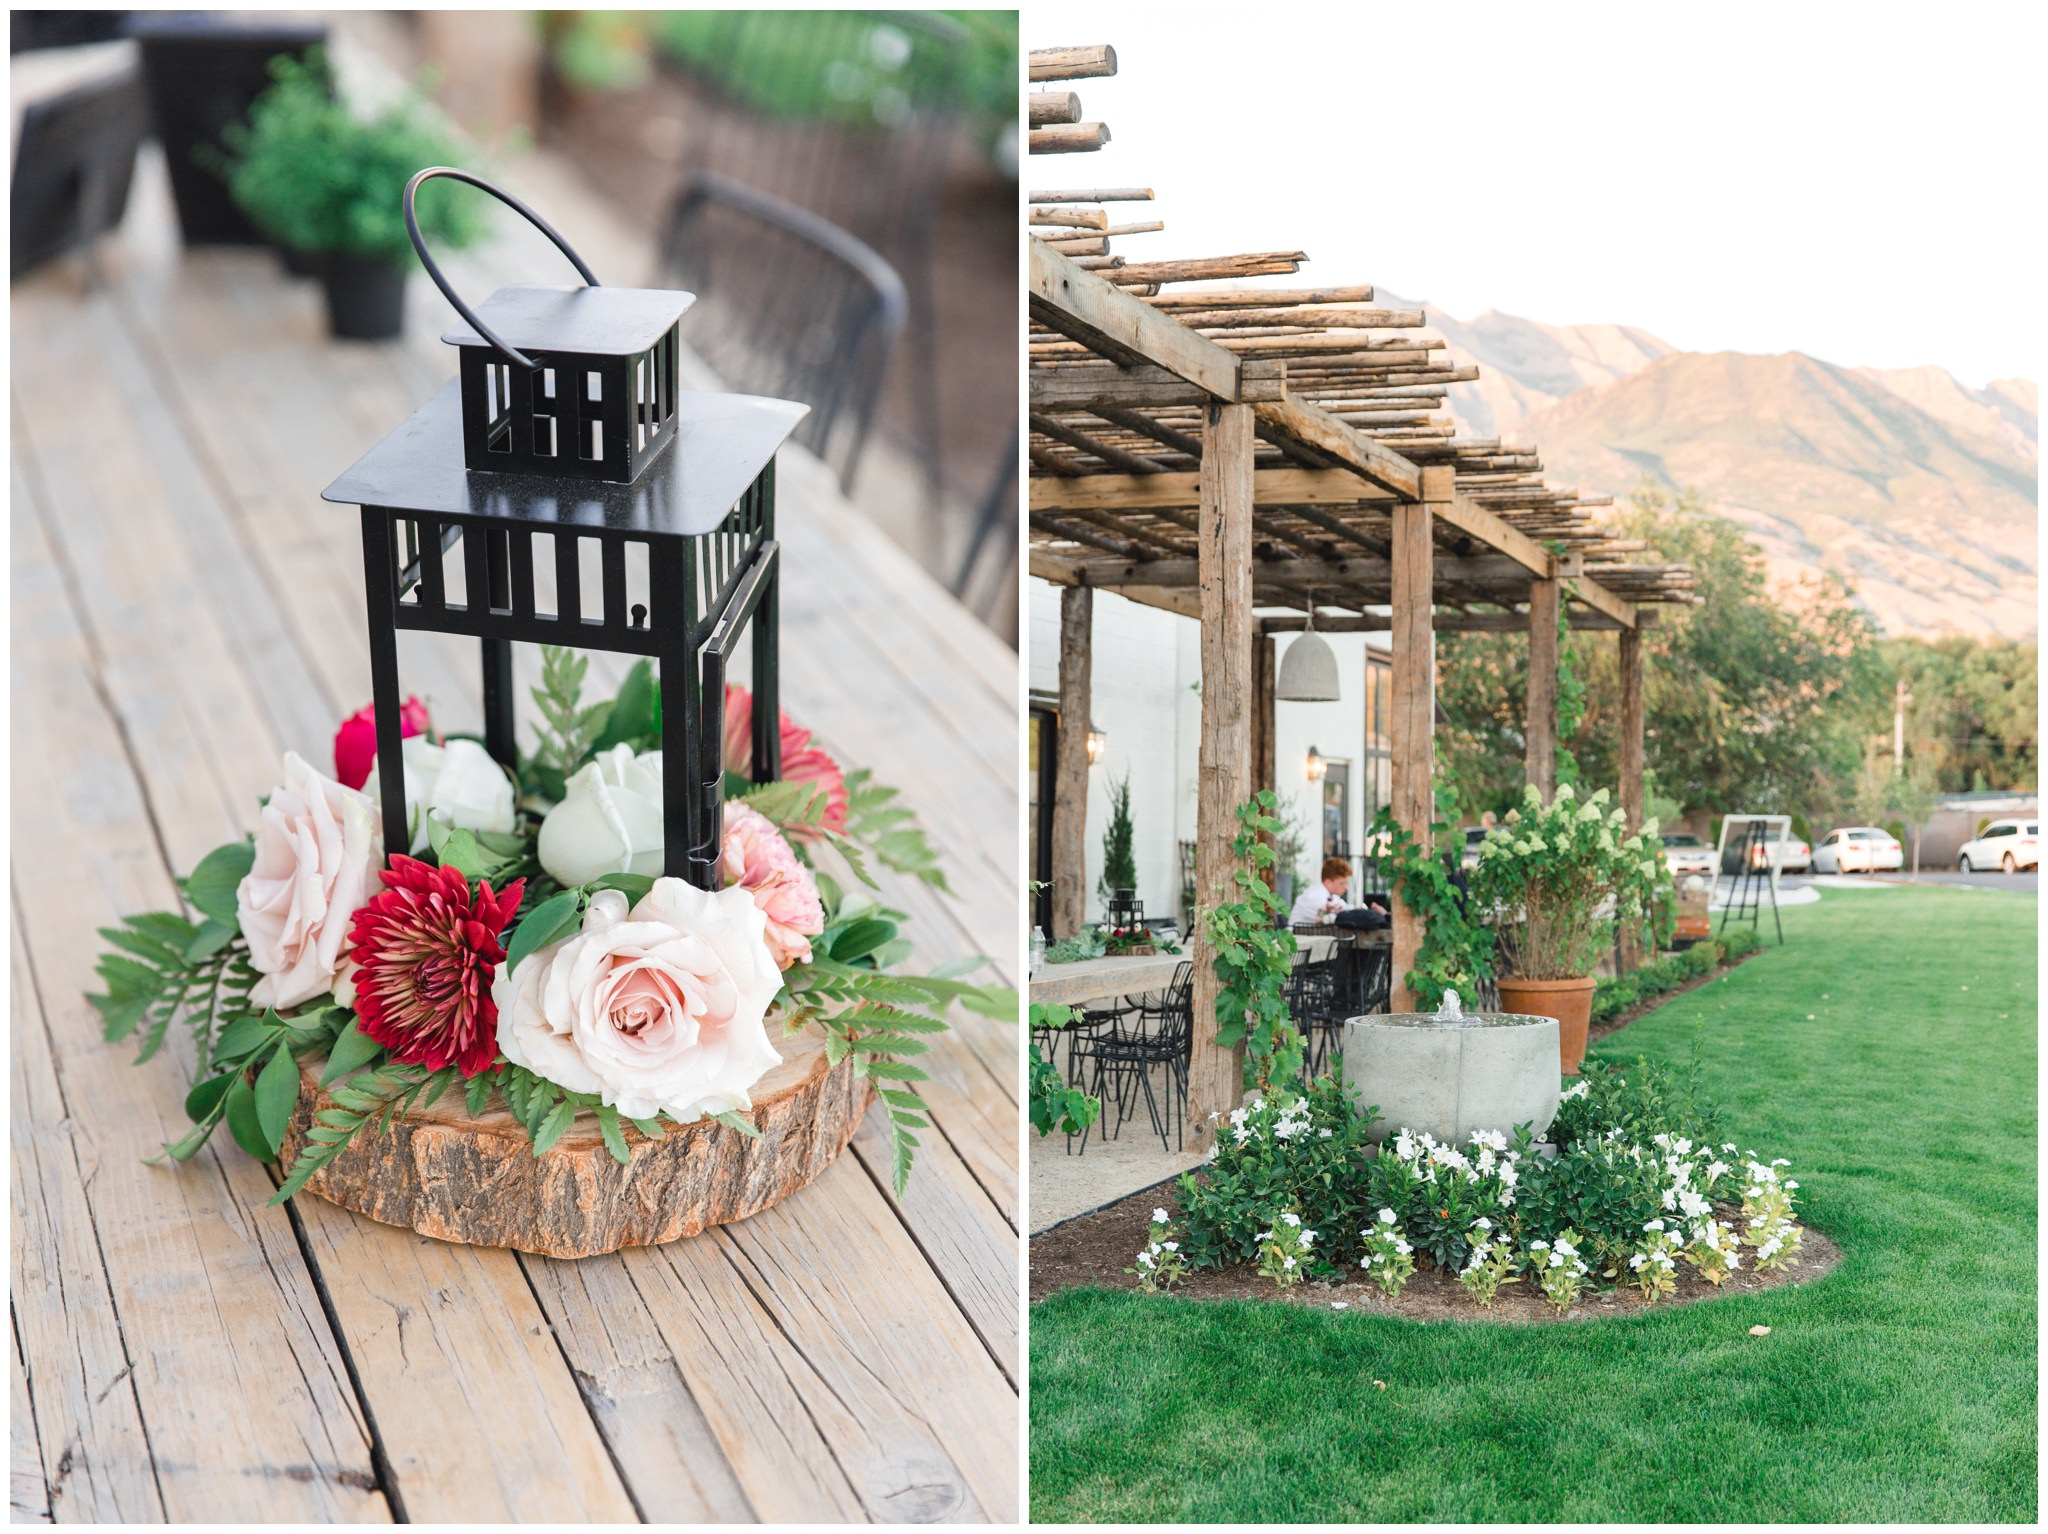 Wedding details of burgundy and deep red floral arrangements at wedding in Utah